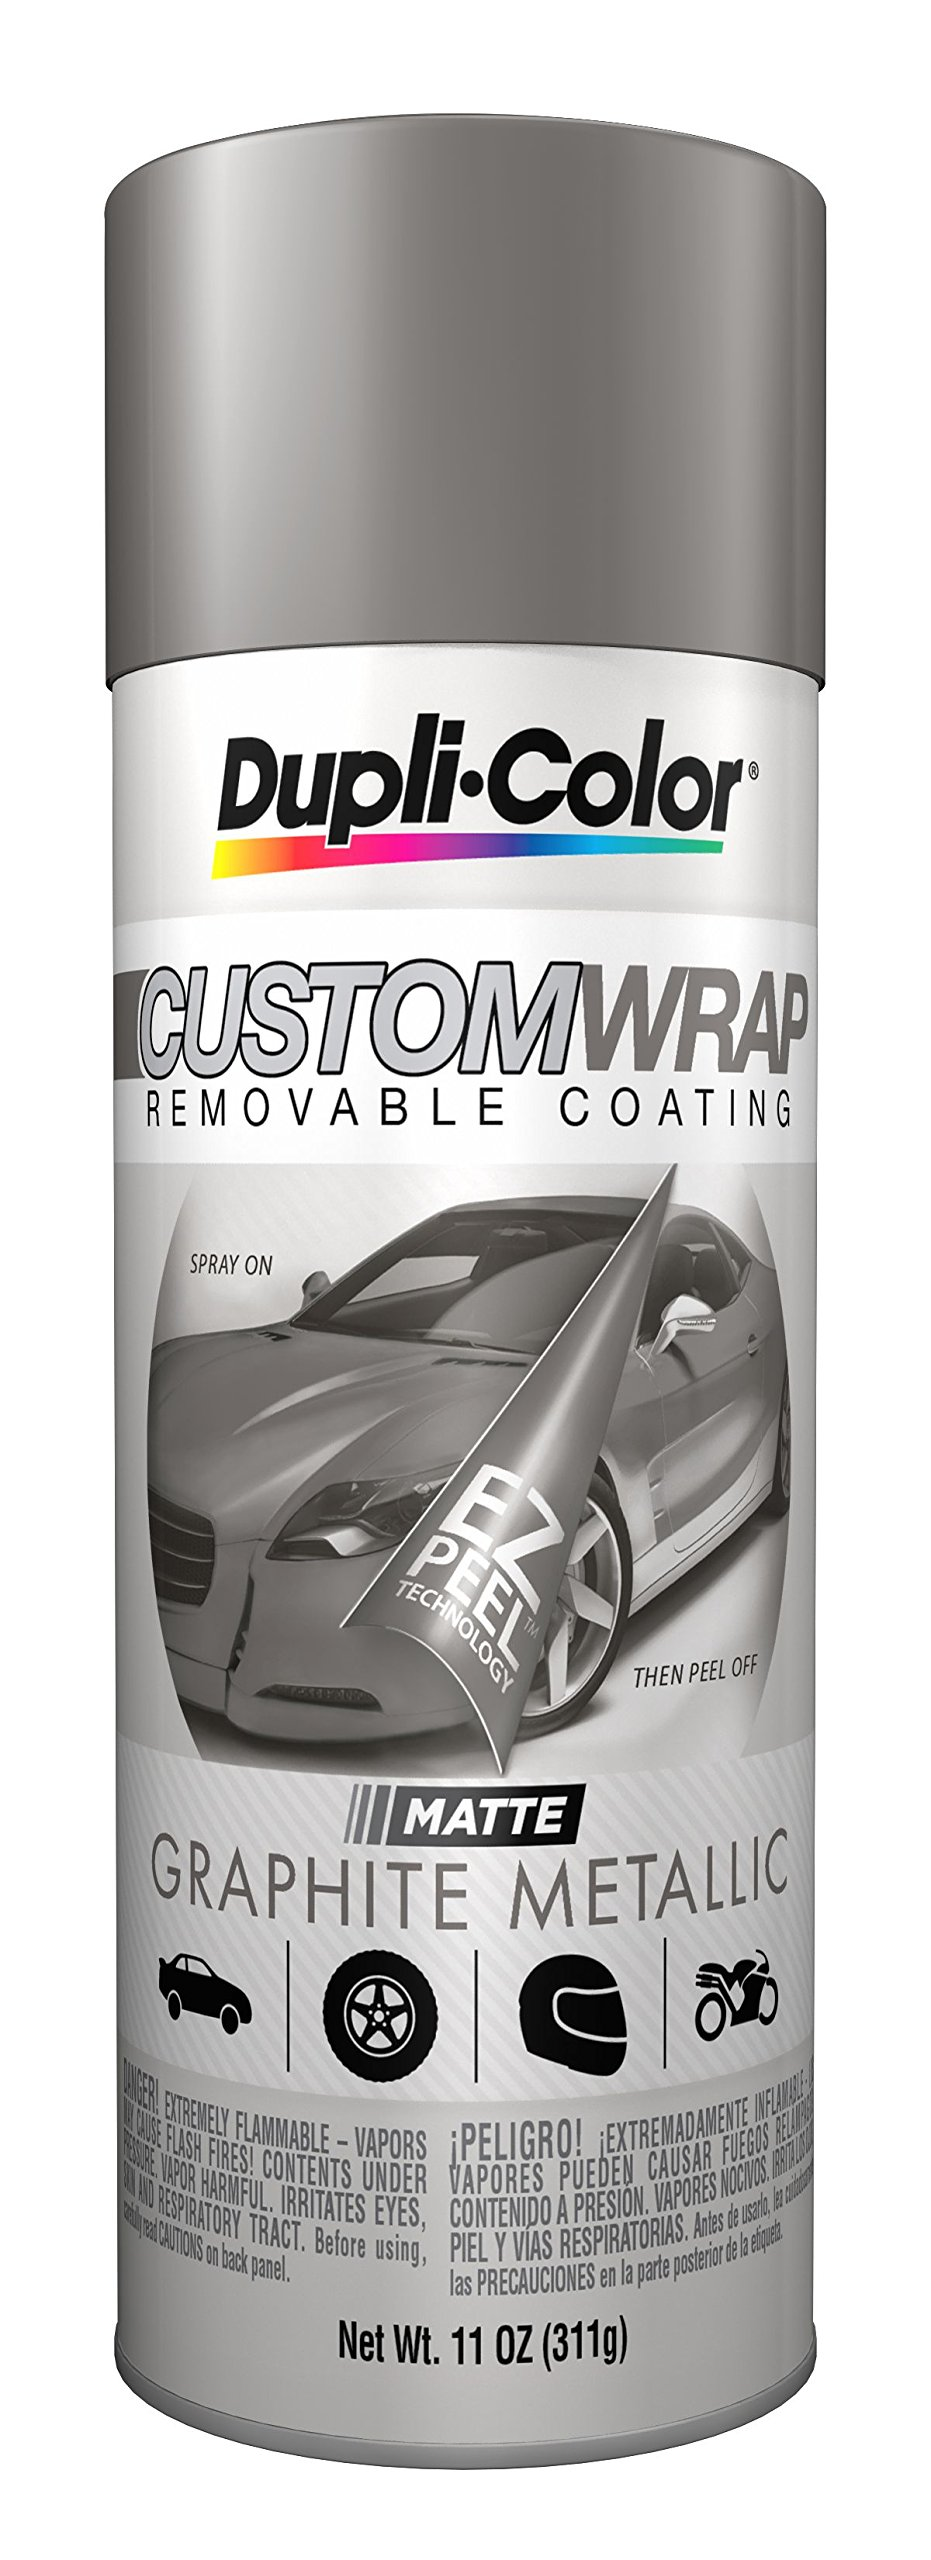 Dupli-Color ECWRC7977-6 PK Custom Wrap Removable Coating - 11 fl. oz, (Pack of 6)